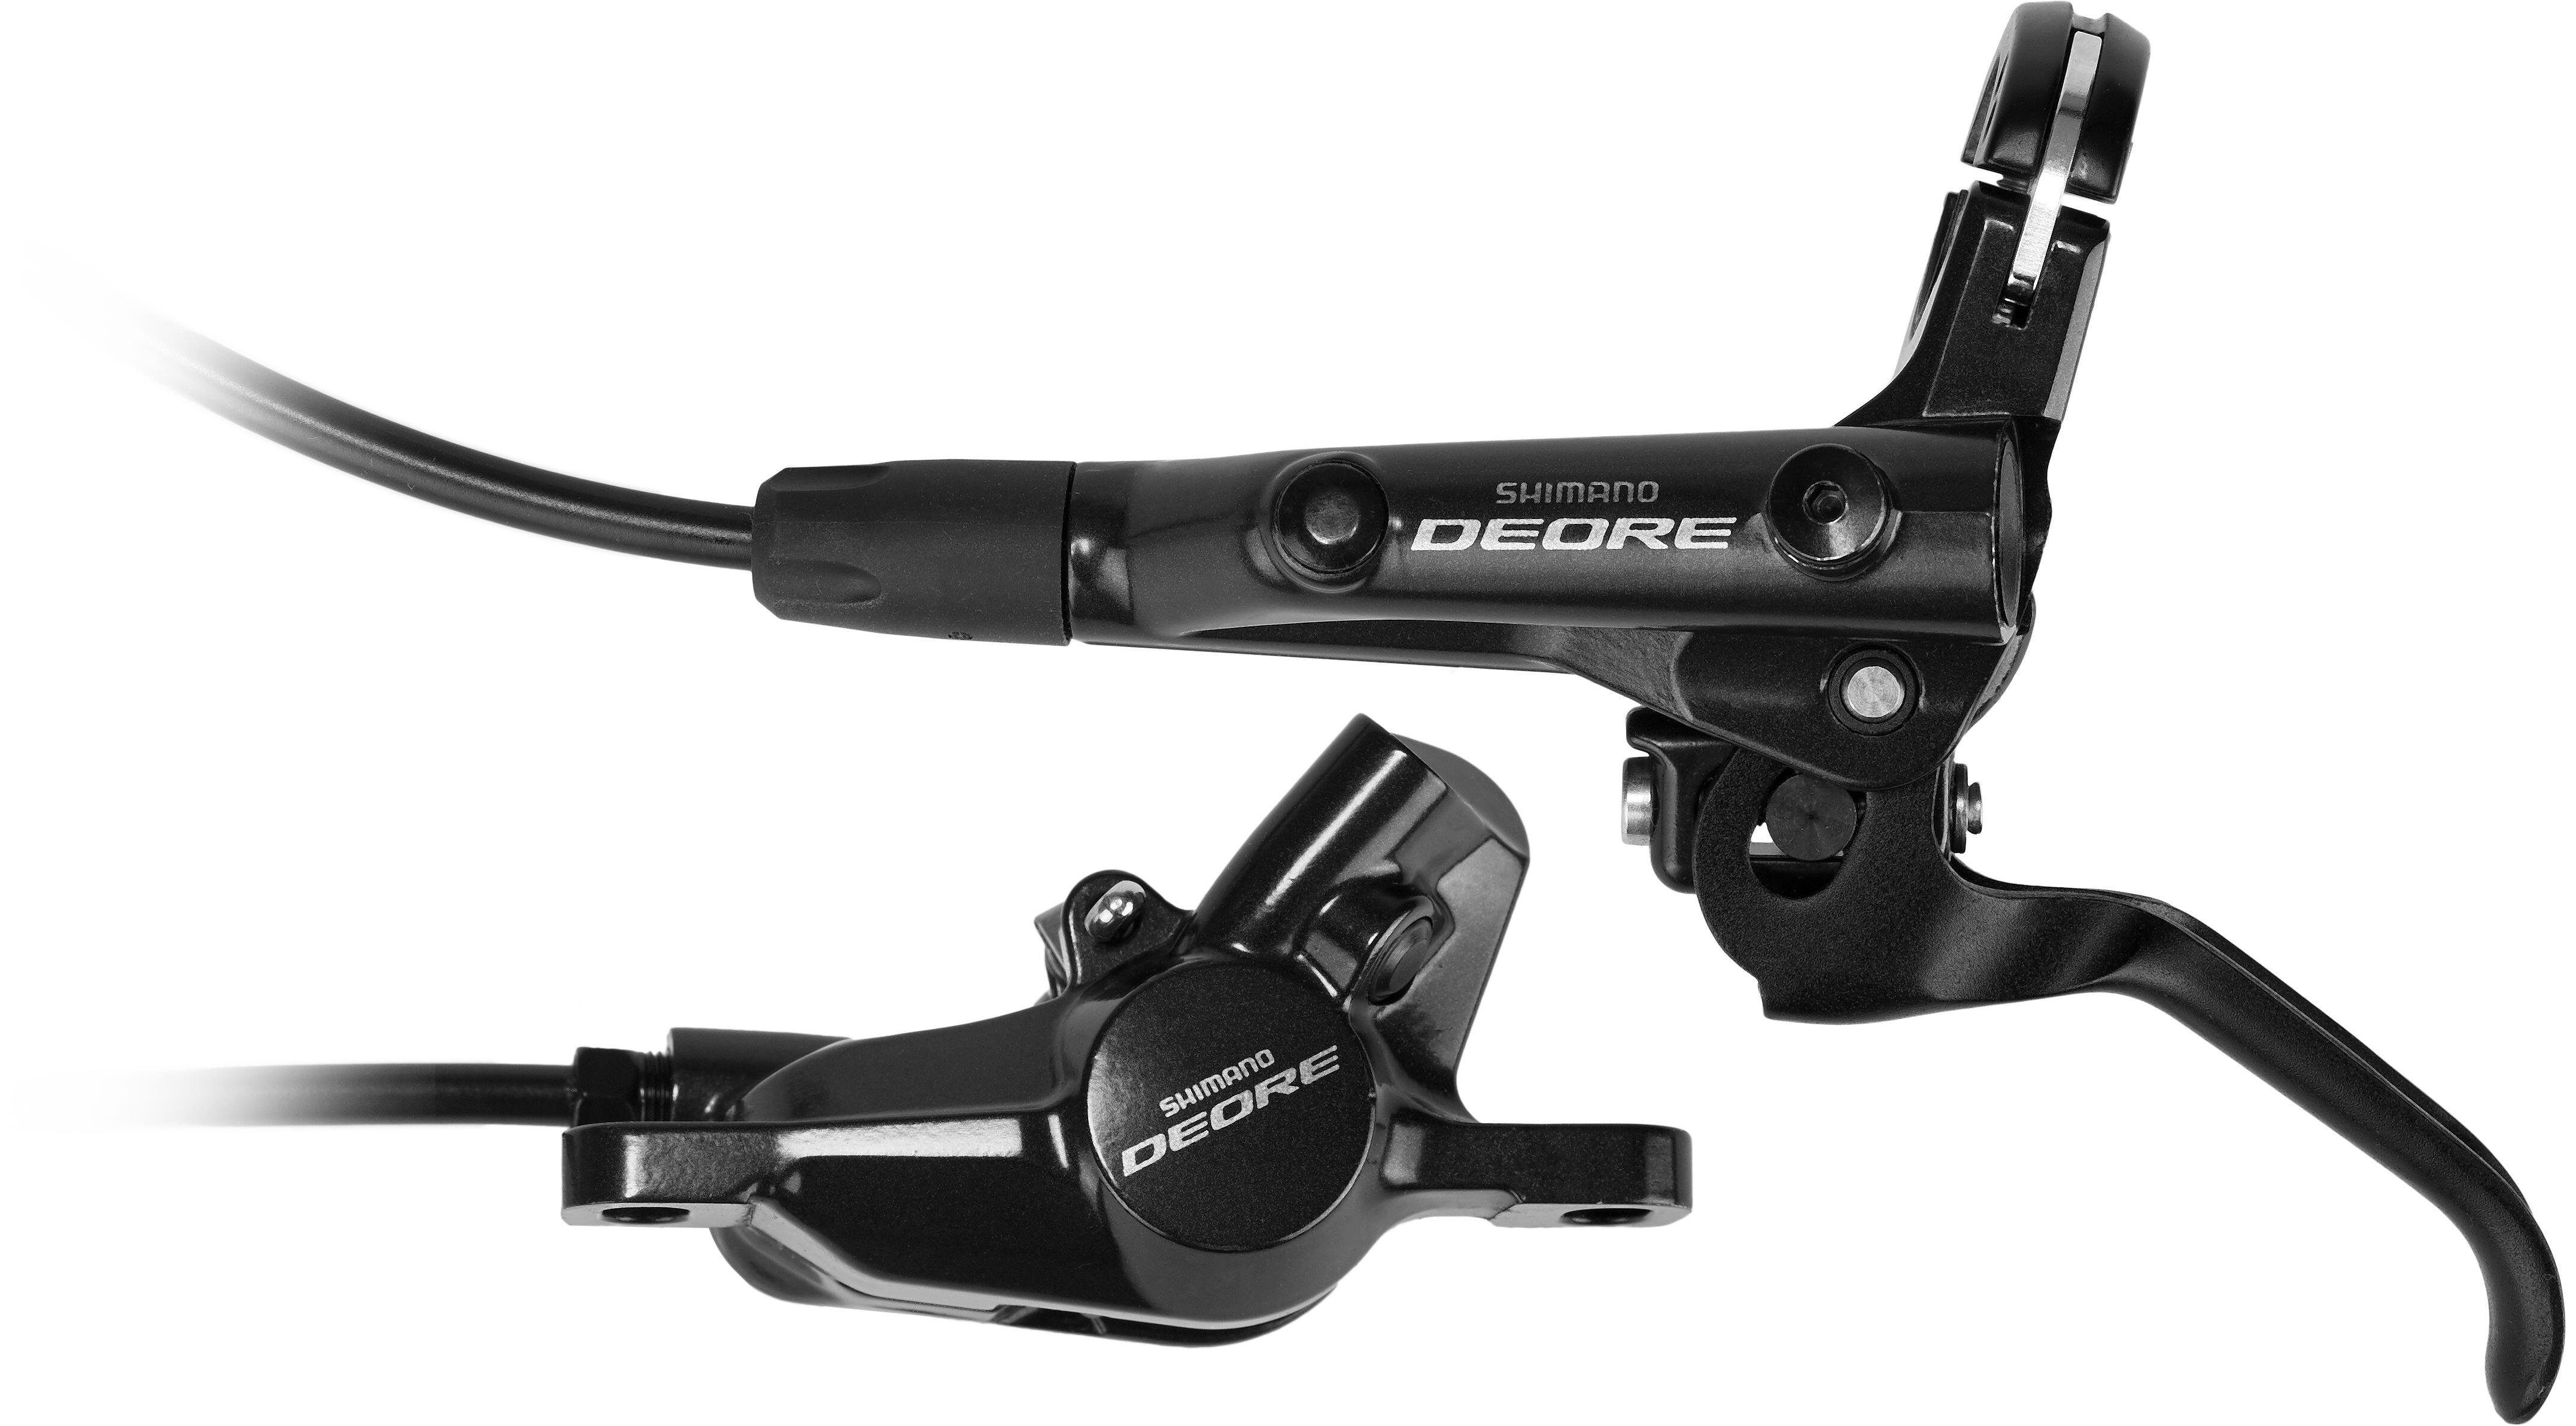 13a404b6fb5 Shimano Deore BR-M6000 Disc Brake Front black at Bikester.co.uk